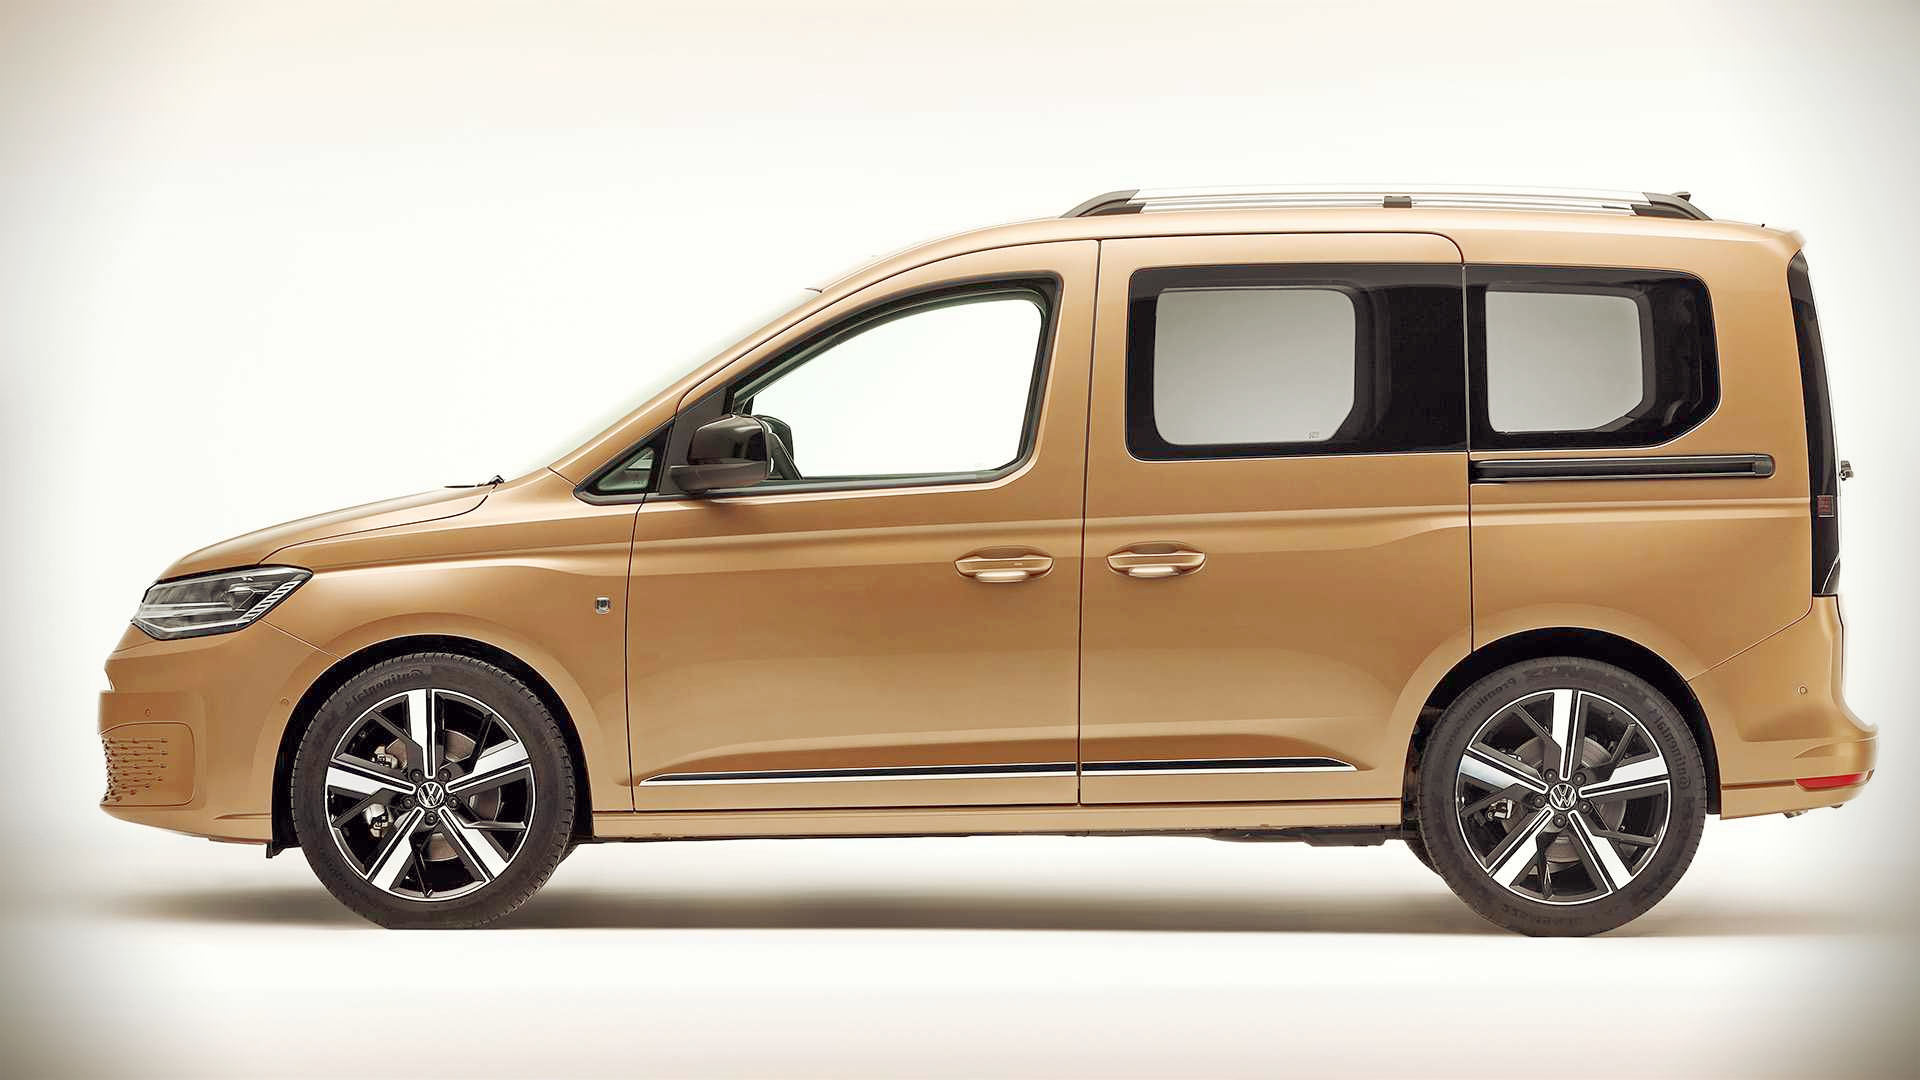 2021 Volkswagen Caddy Side Wallpaper Hd